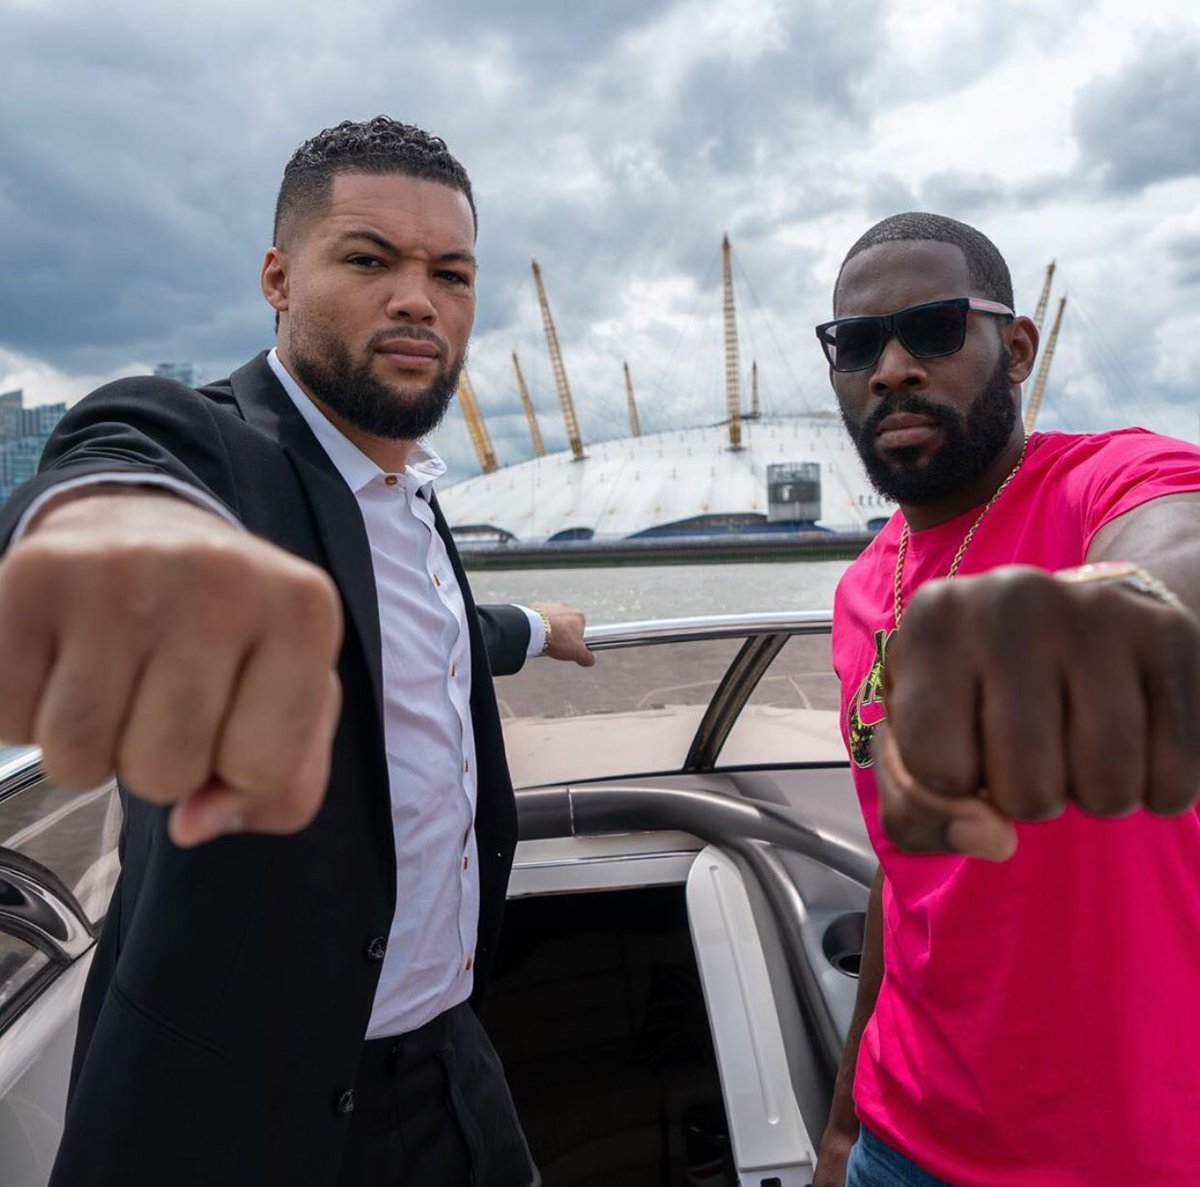 Heavyweights-Joe-Joyce-vs-Bryant-Jennings